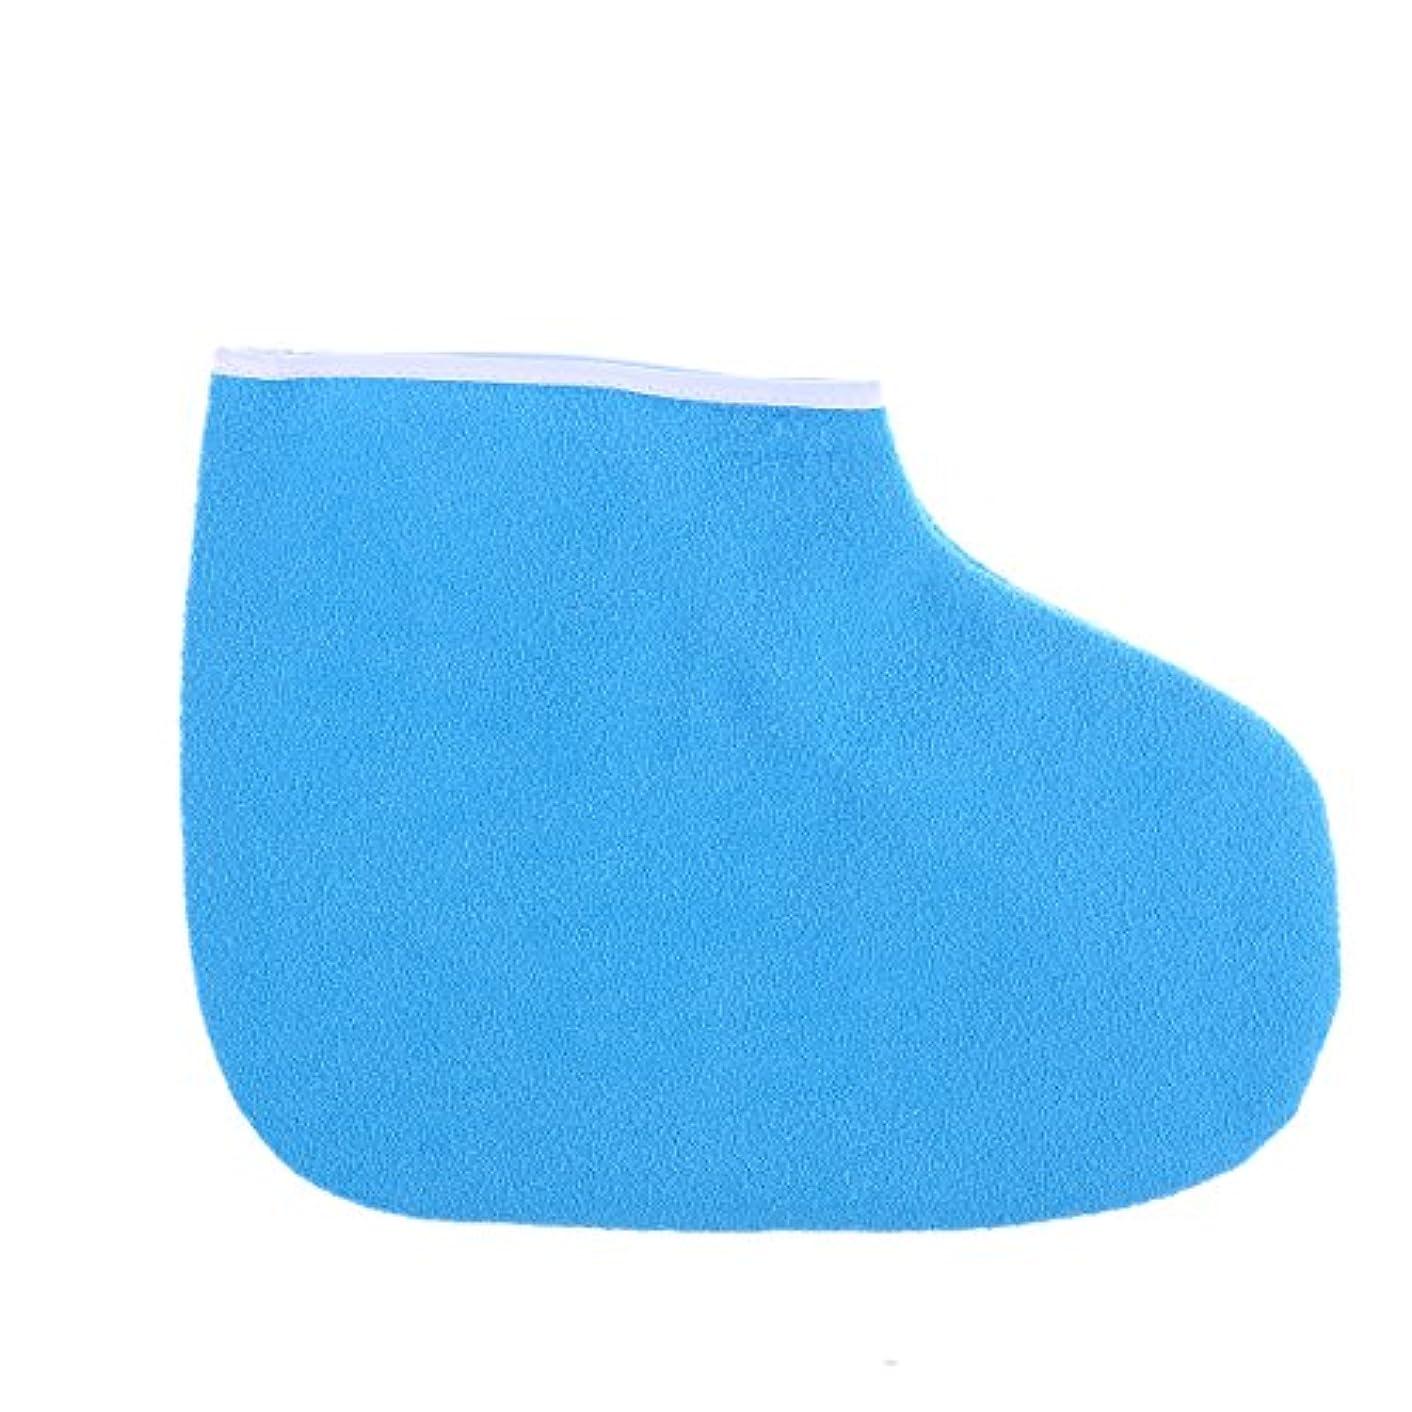 HEALLILY パラフィンブーティワックスバスフットスパカバー温熱療法絶縁ソフトコットン保湿フットストラップ(ブルー)